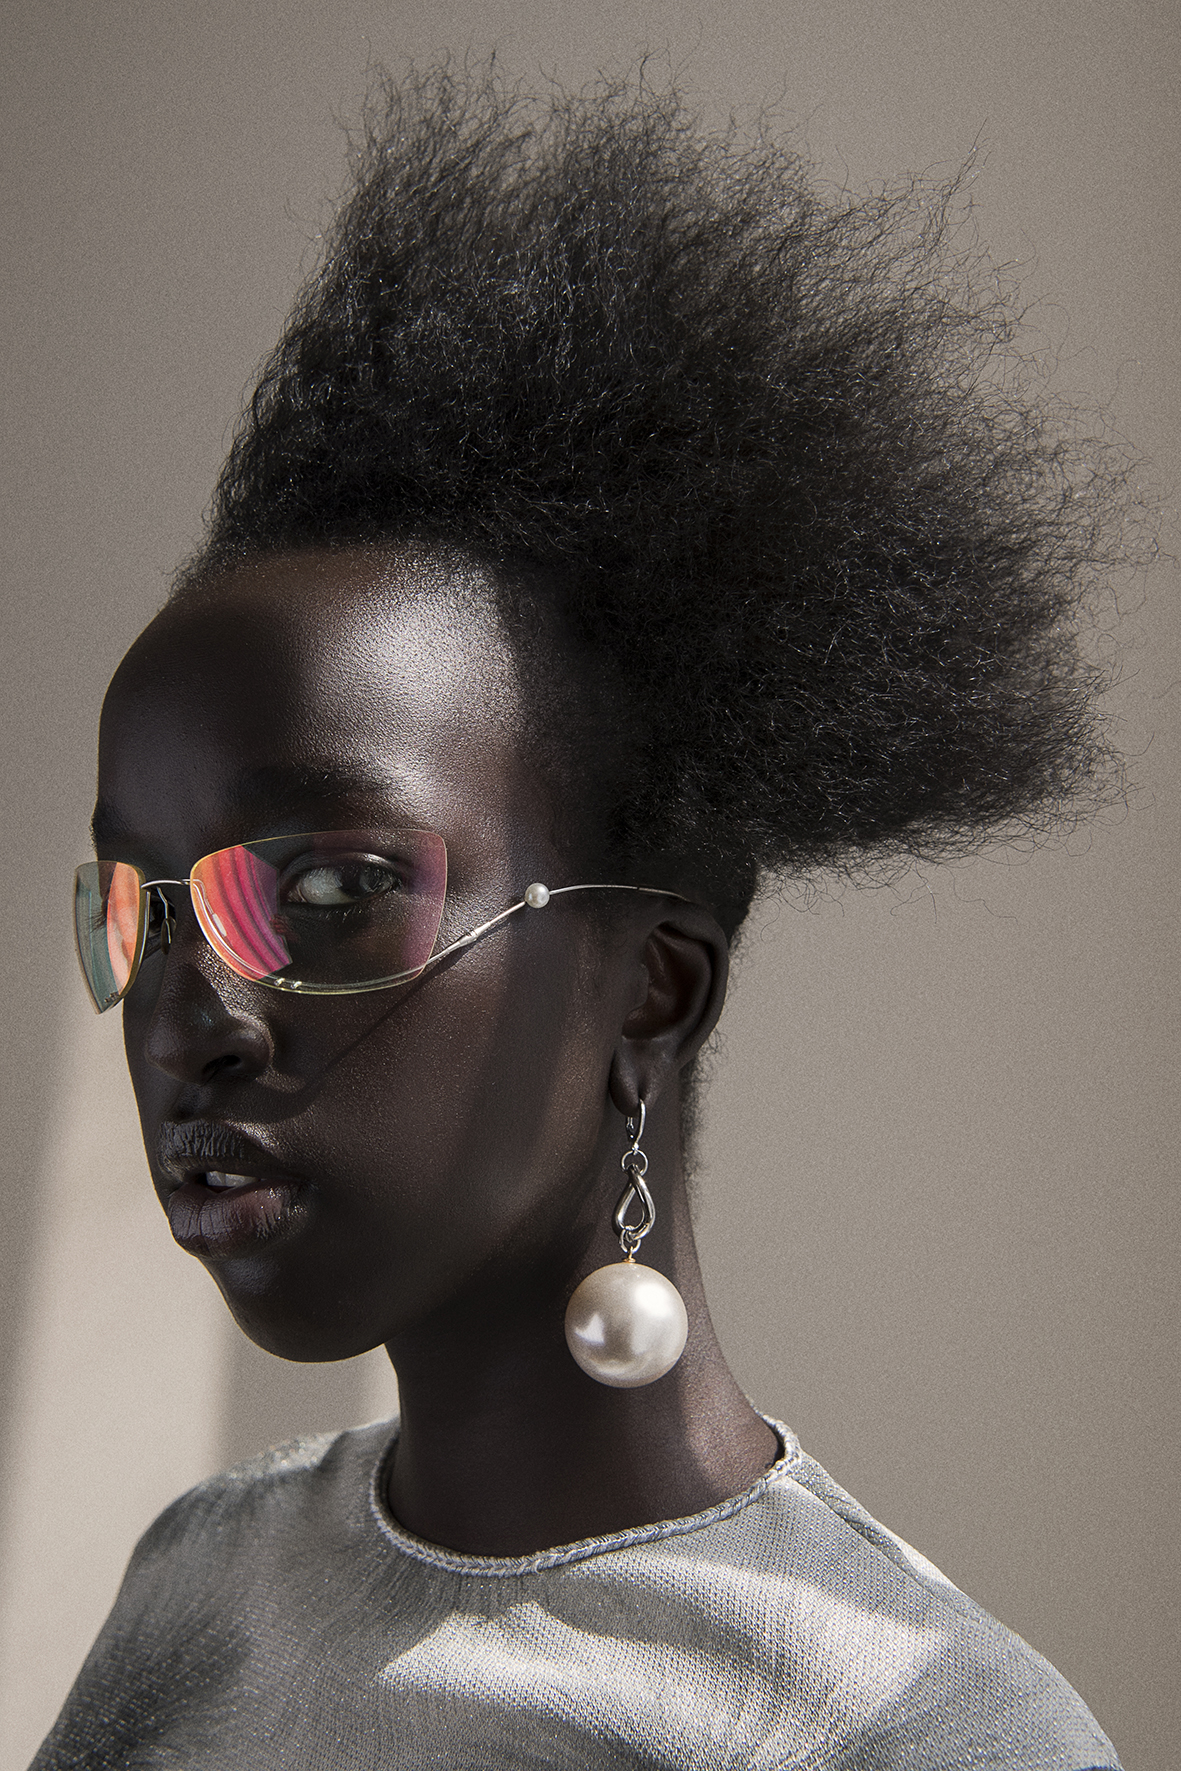 dress  the market cartel  sunglasses  vintage chanel  corset  freckle made  earring  aaizél